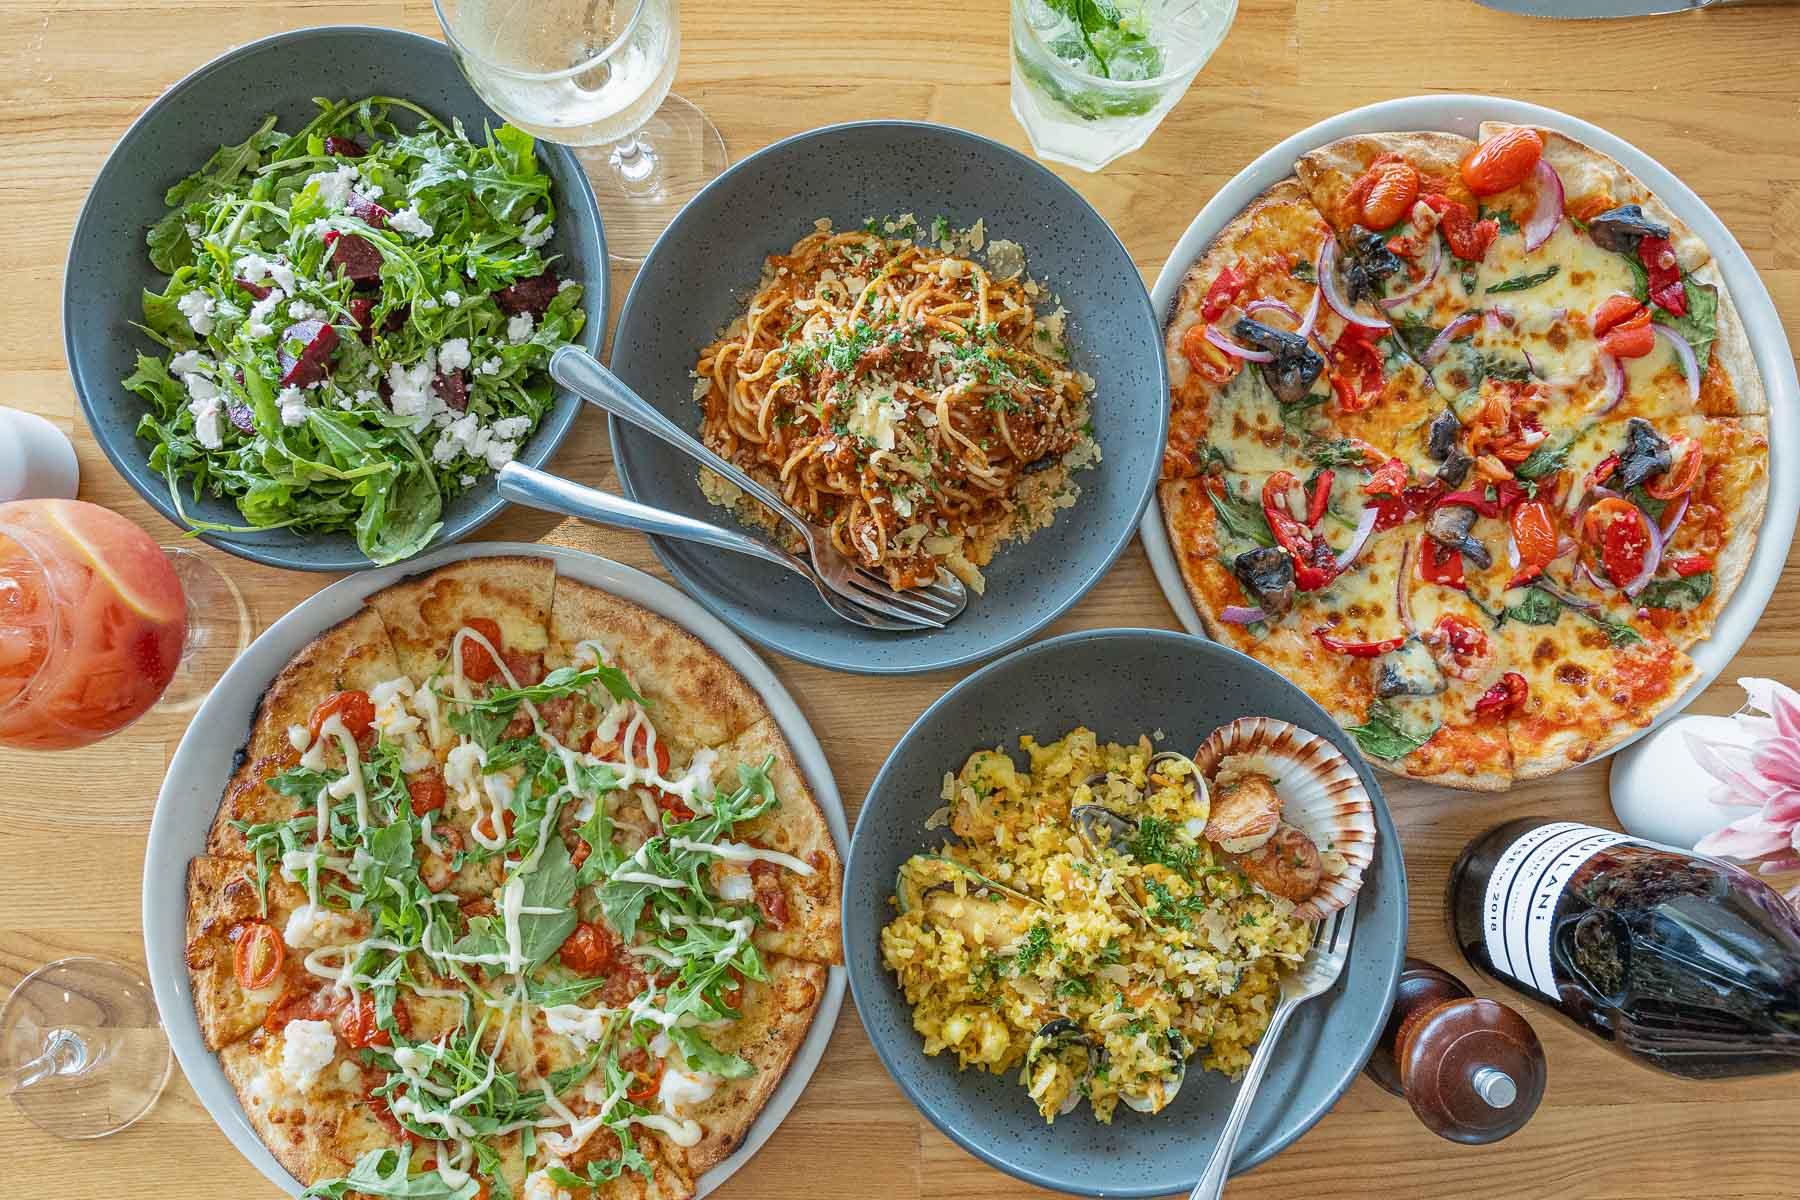 pasta, pizza and salads at Sorrento restaurant bar, Whitsunday Region